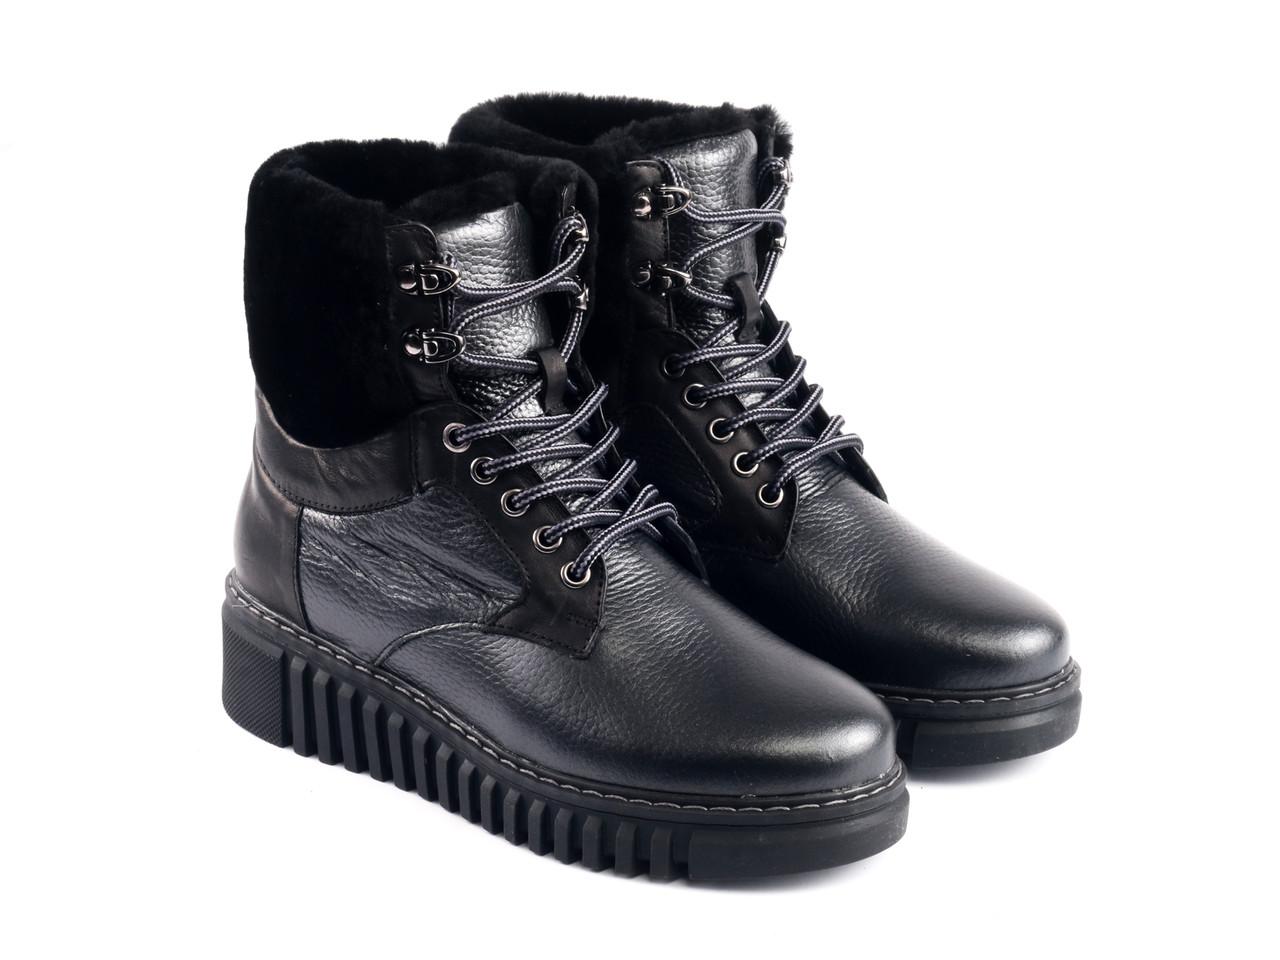 Ботинки Etor 6720-18406-14173 антрацит, фото 1